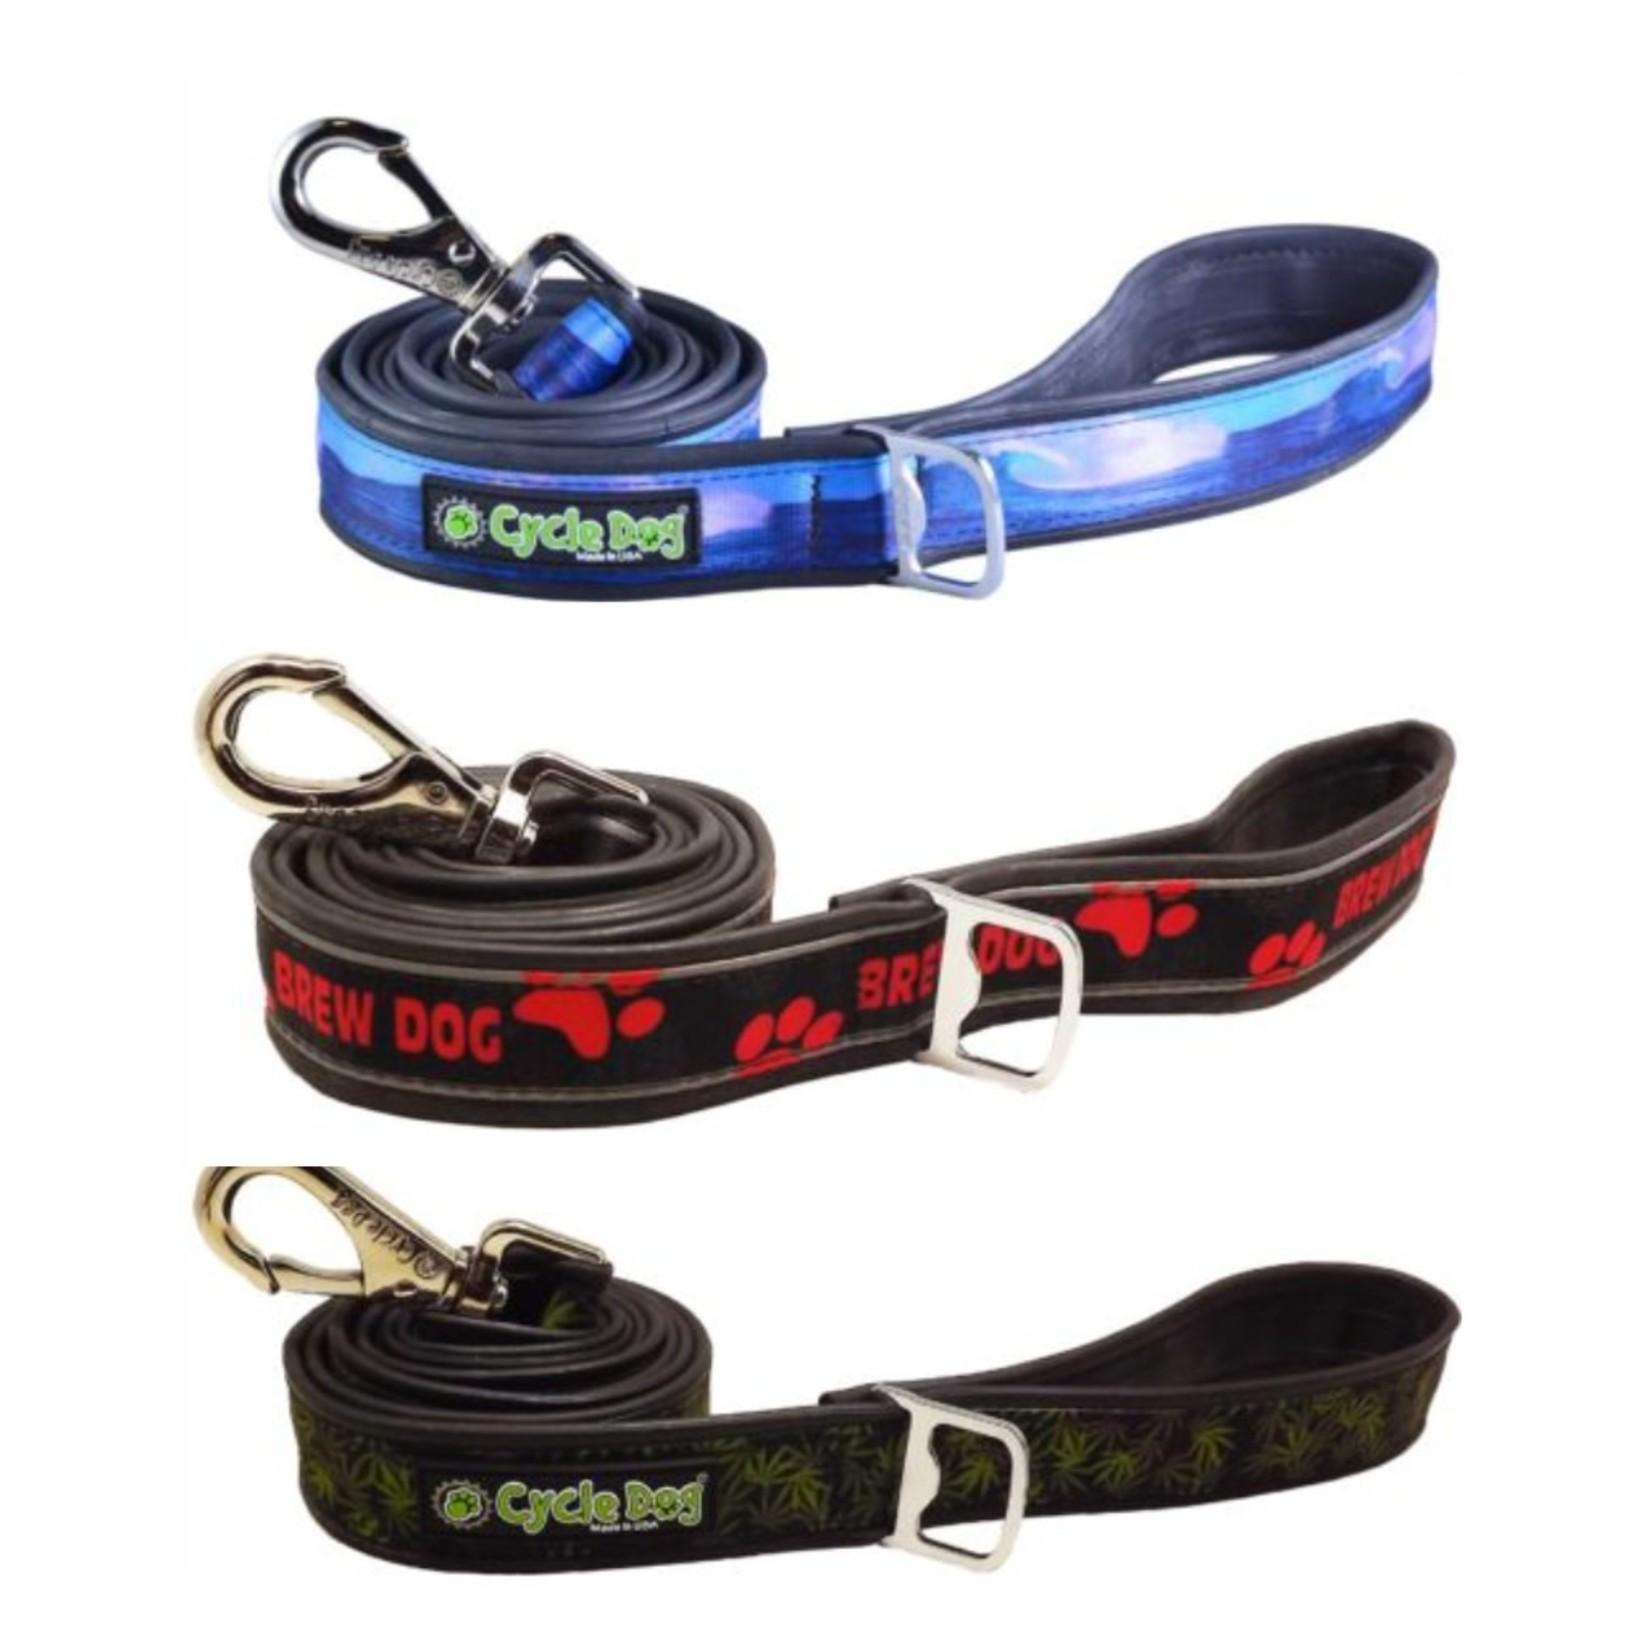 Island Surf Company Cycle Dog Leash